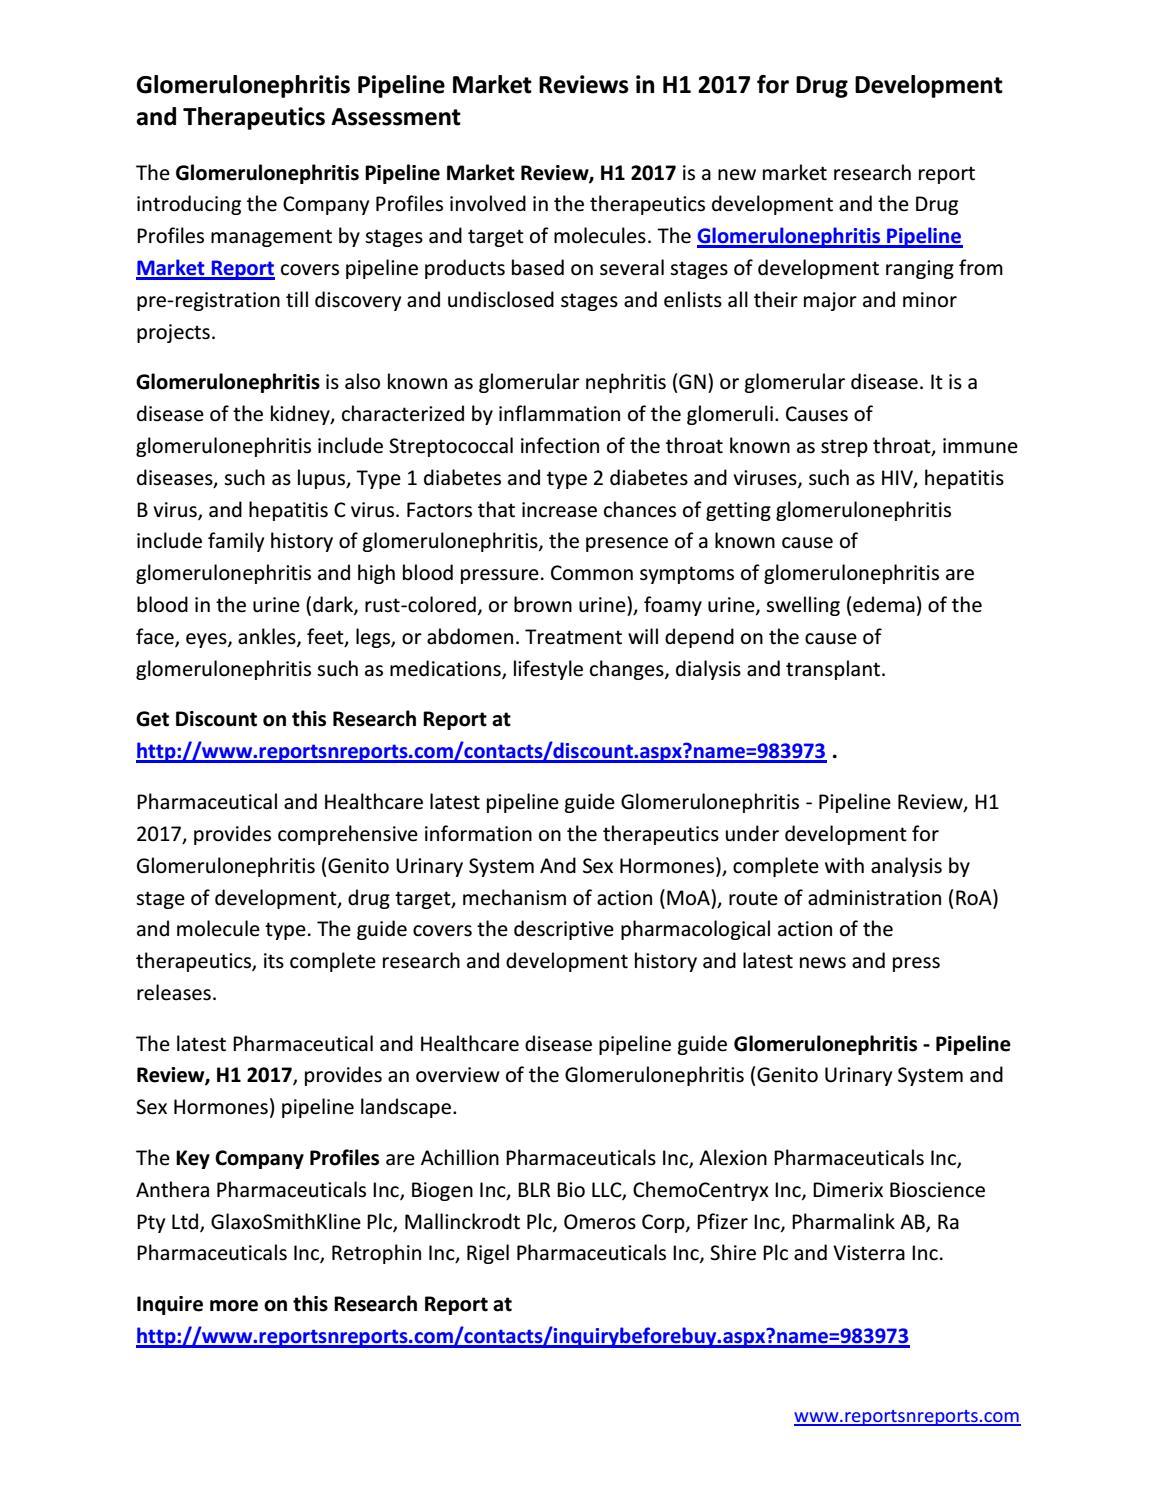 Glomerulonephritis Pipeline Therapeutics Market Report for